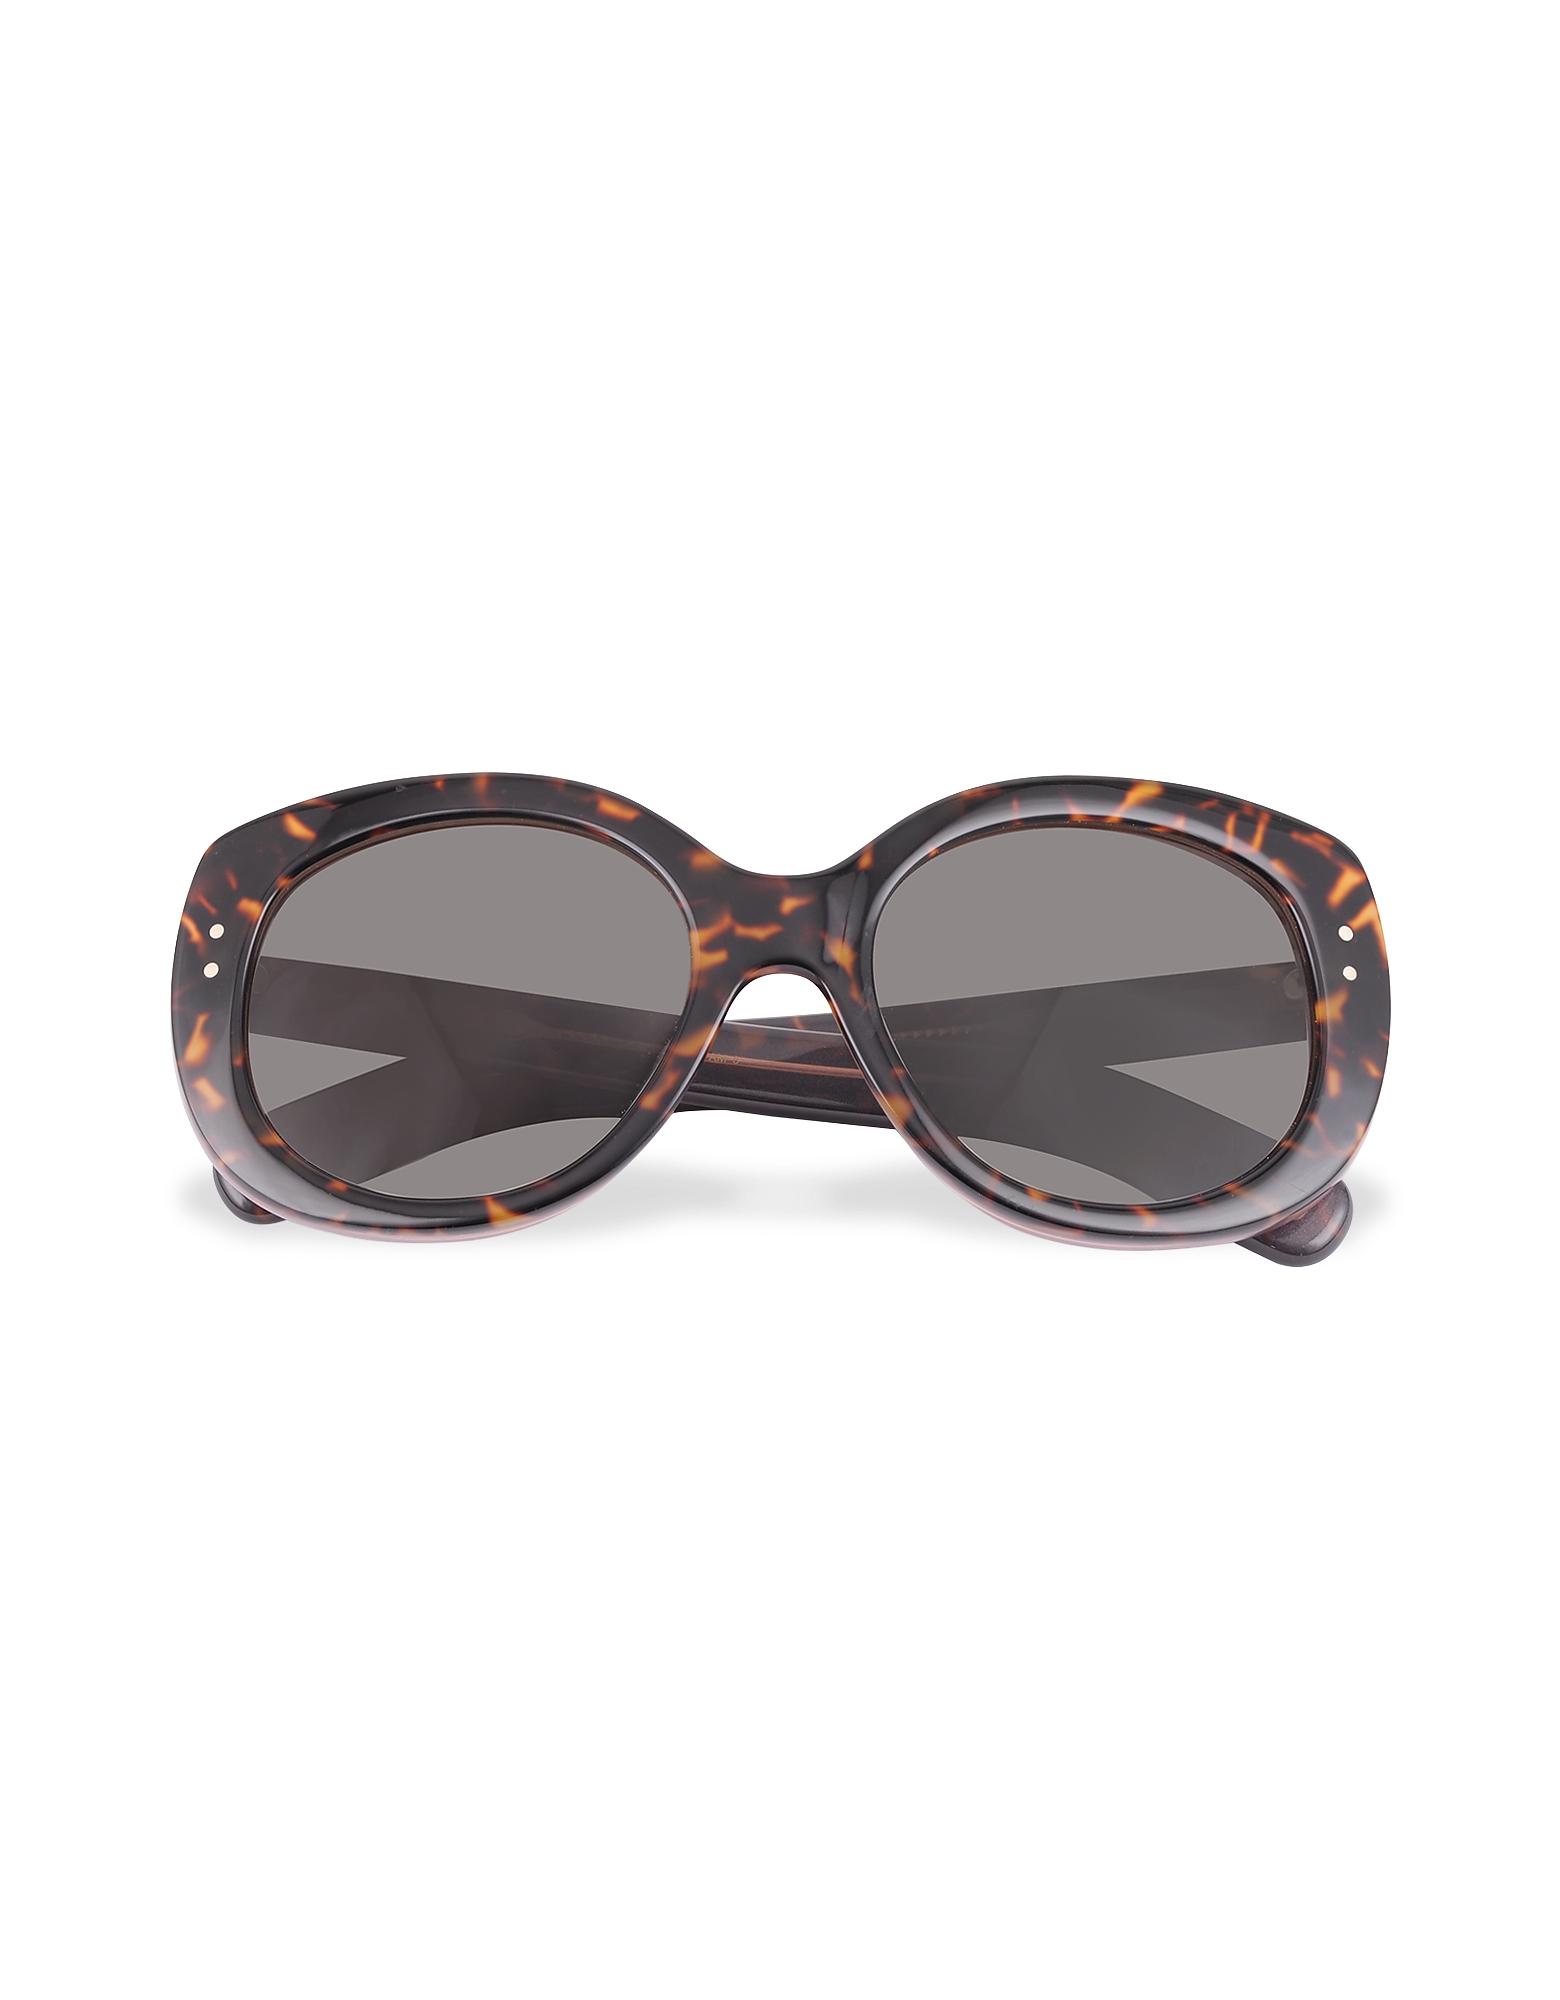 Marc Jacobs Designer Sunglasses, Vintage Inspired Round Frame